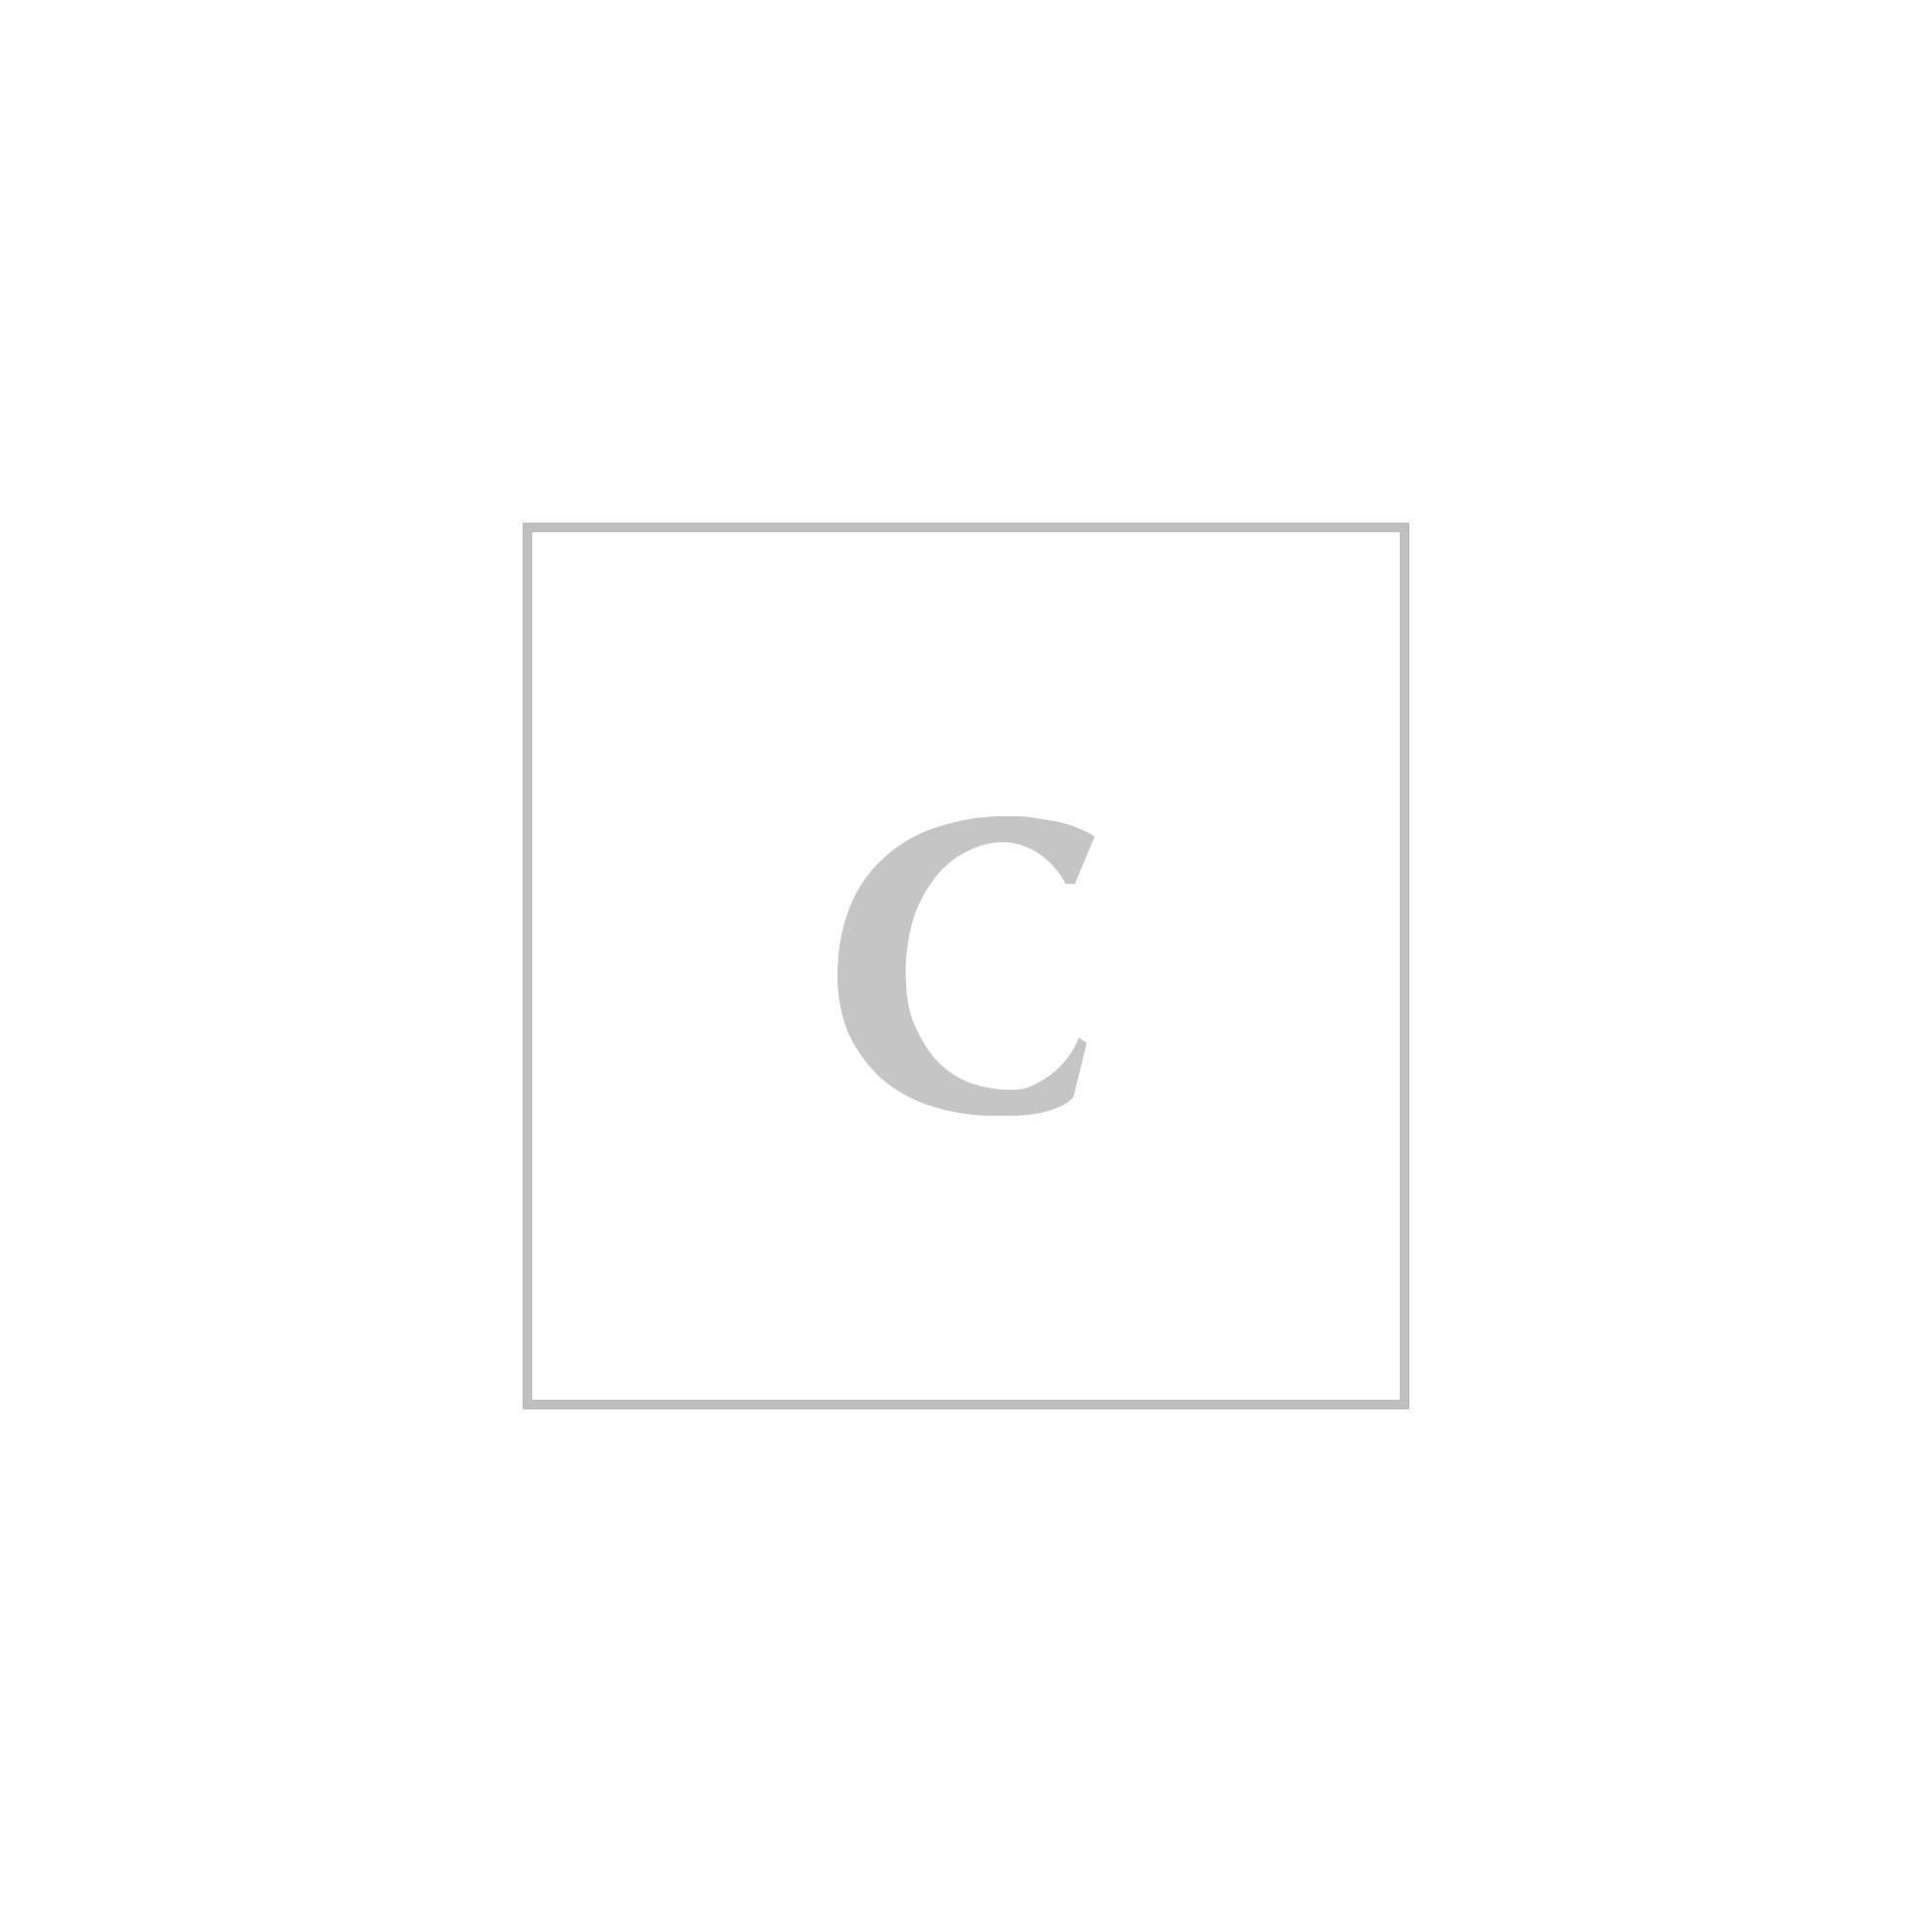 Burberry porta carte credito sandon